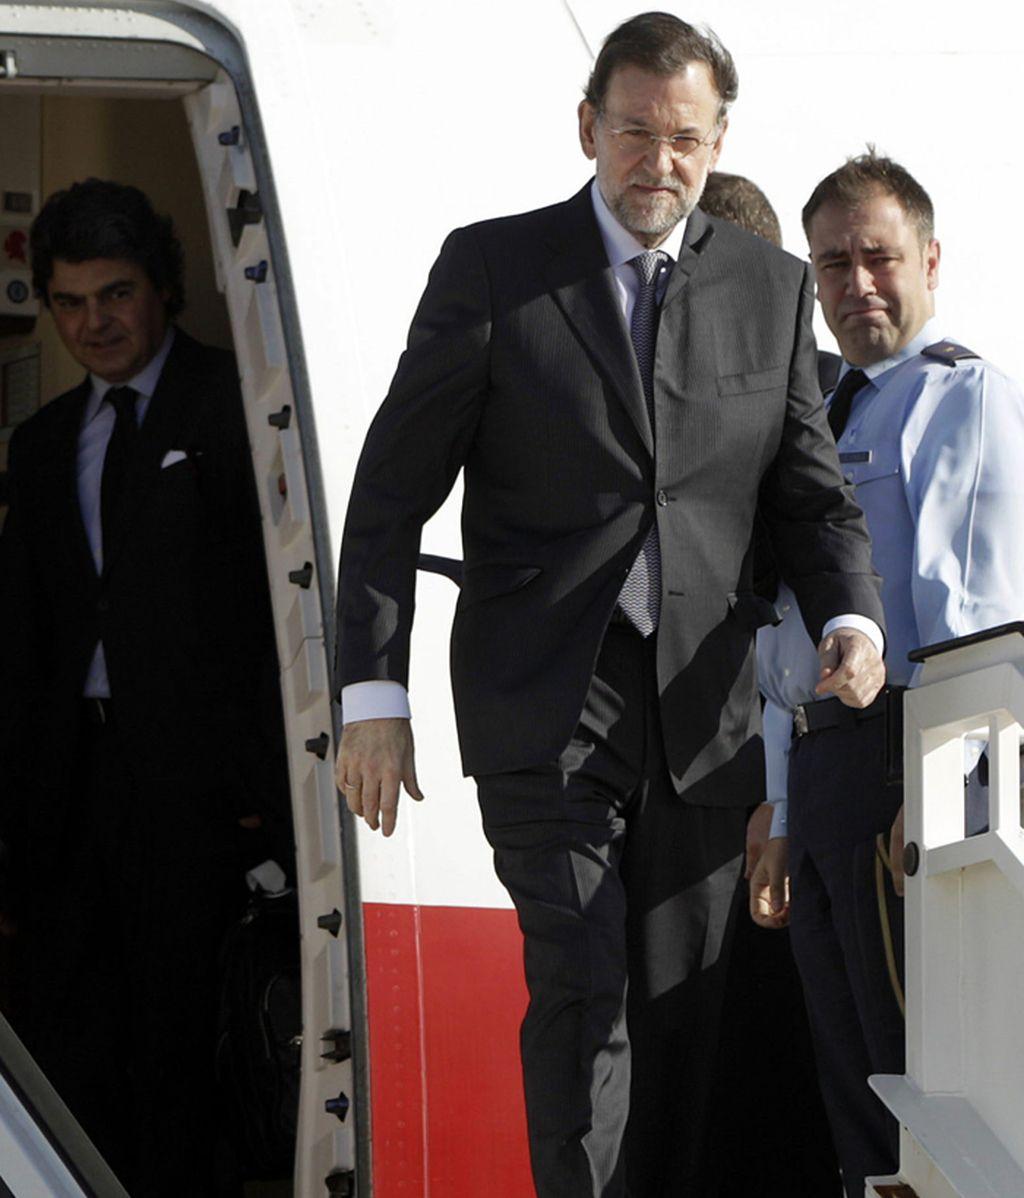 Llegada a Cádiz del presidente español, Mariano Rajoy, para asistir a la XXII Cumbre Iberoamericana